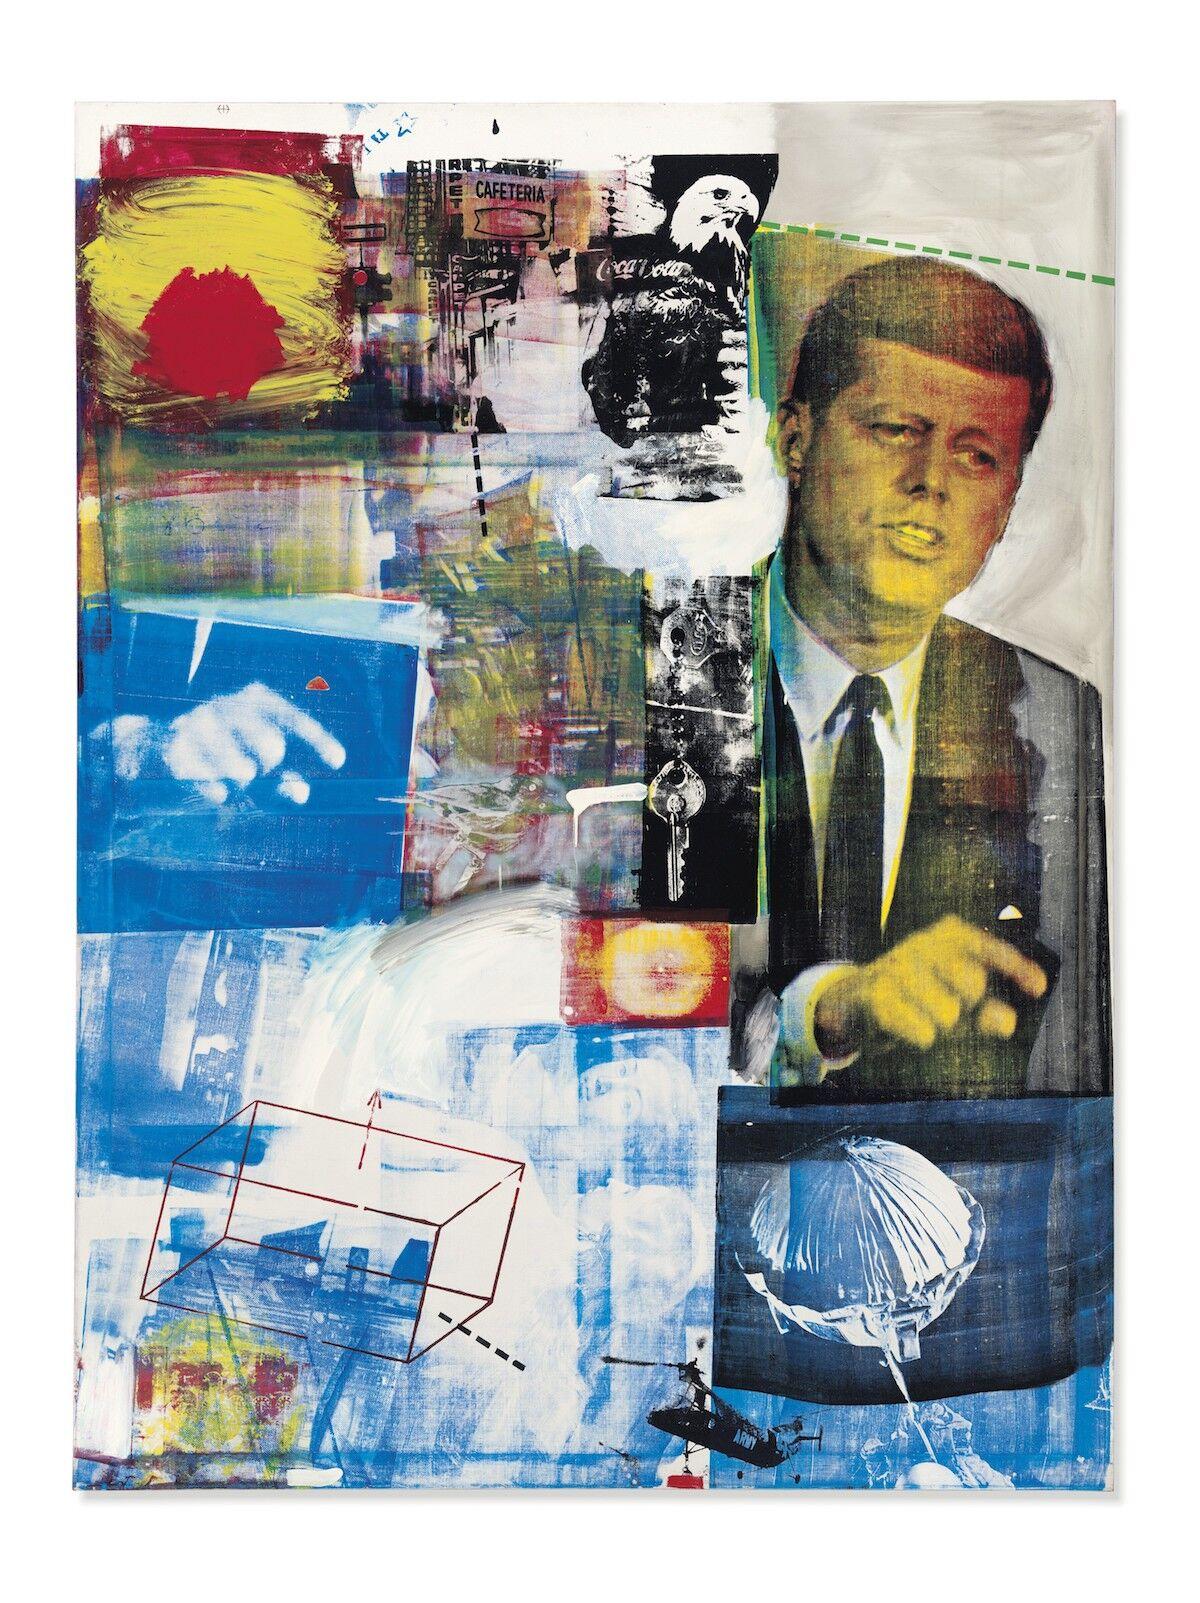 Robert Rauschenberg, Buffalo II, 1964. Courtesy Christie's.